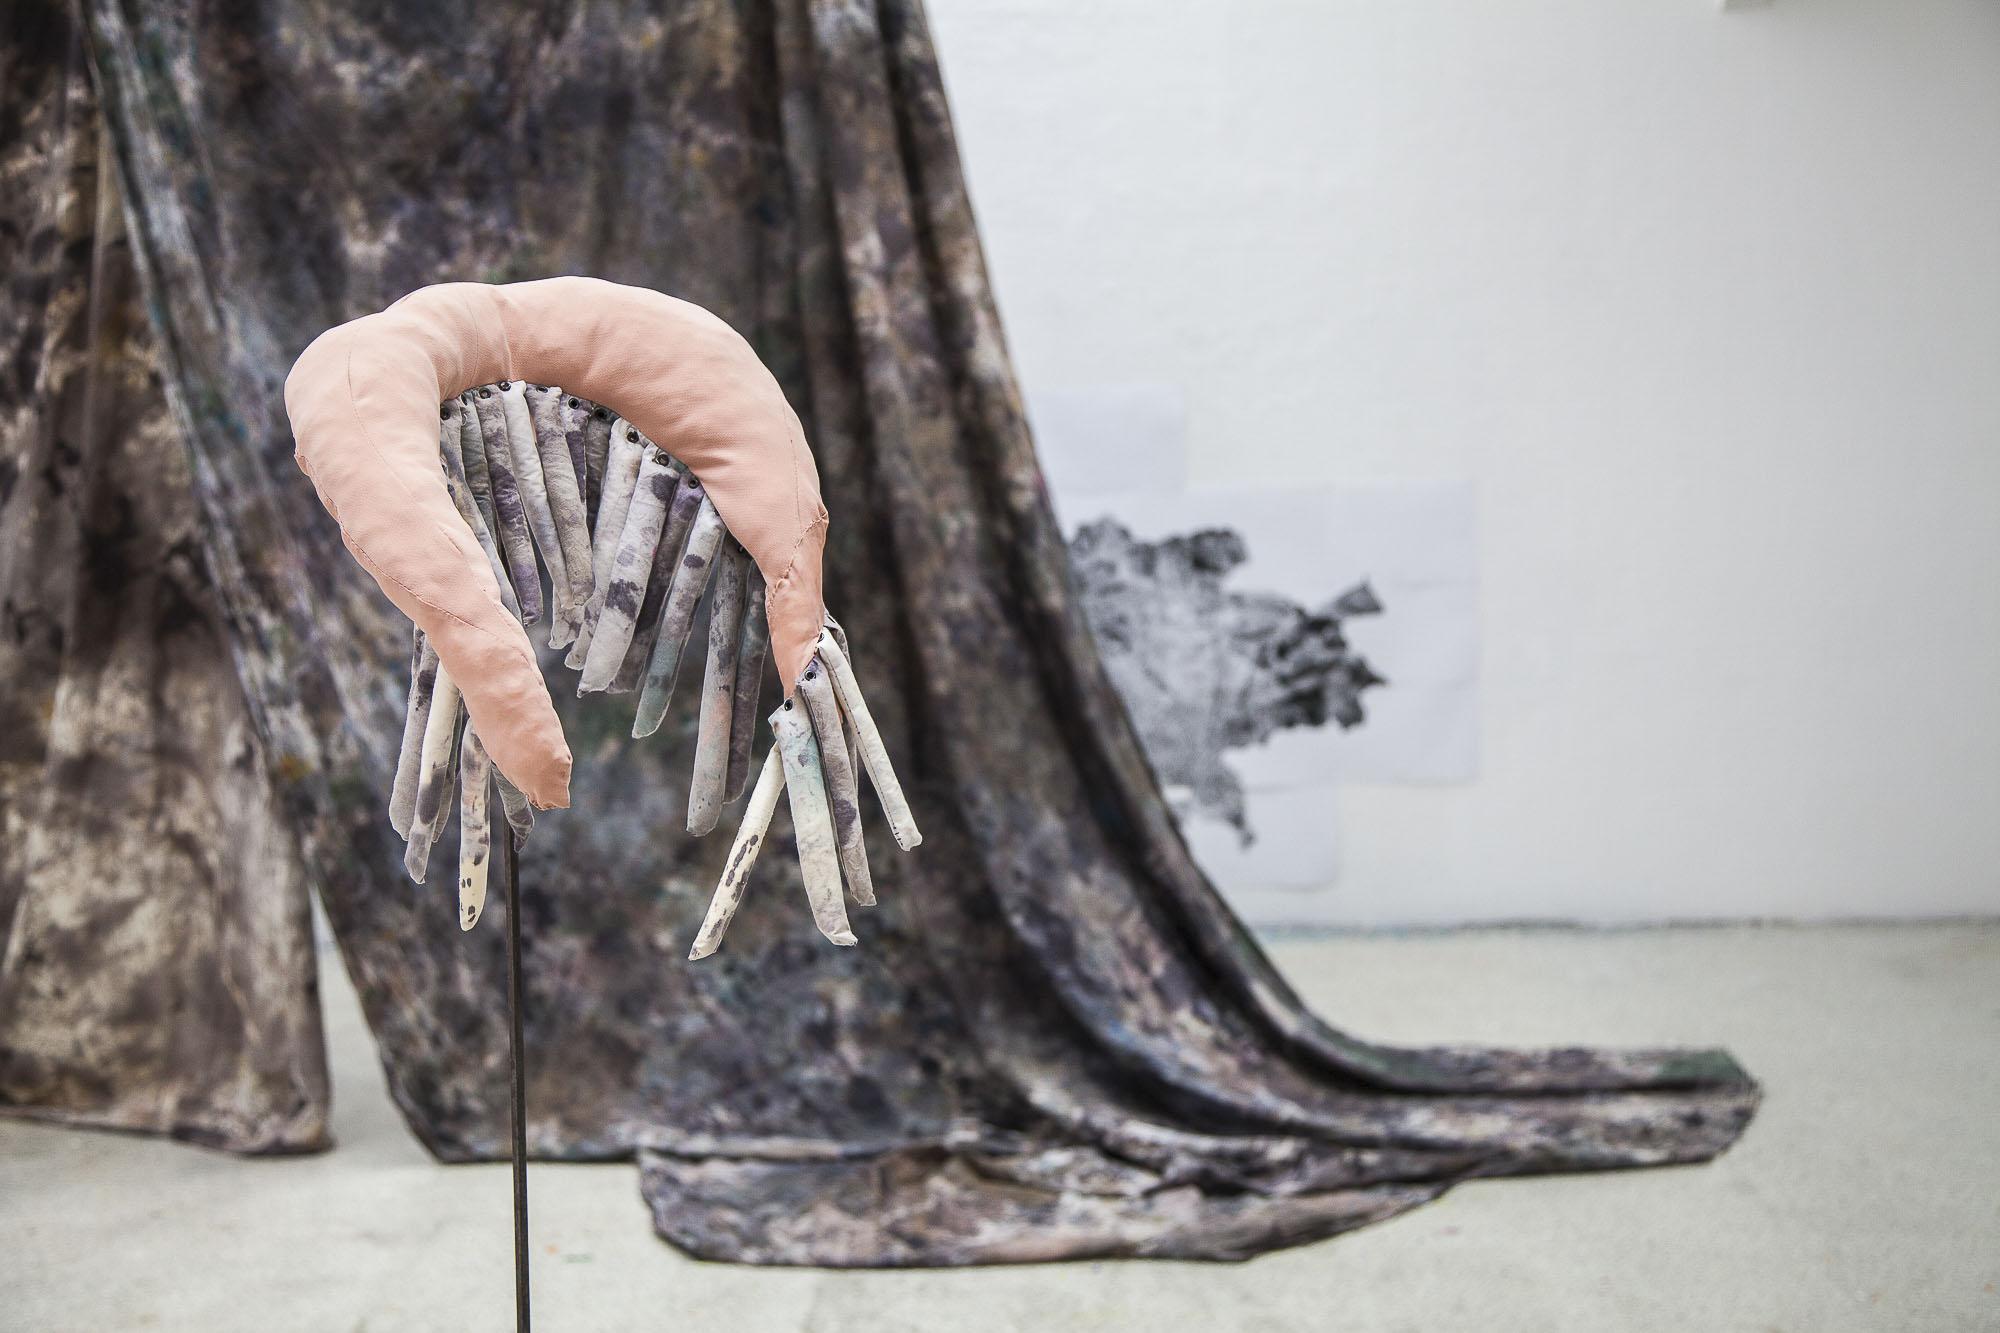 © Katharina Gahlert, object of empathy I, exhibition view, 2019